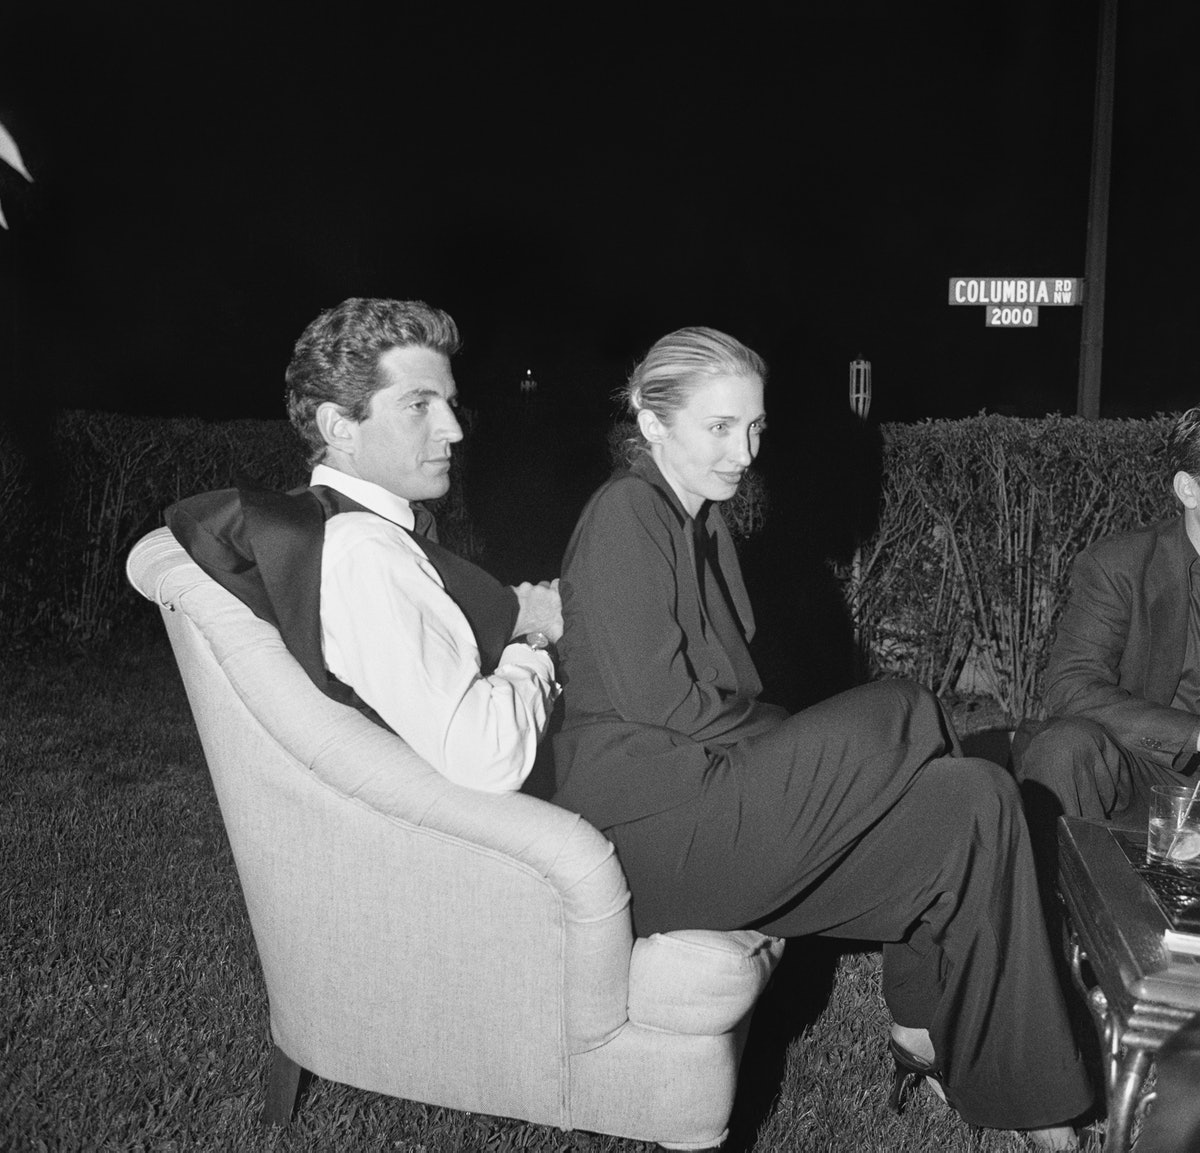 1999.010_White-House-Correspondents-Dinner-John-F.-Kennedy-Jr.-and-Carolyn-Bessette_BWCS99-46_F16-Ex...